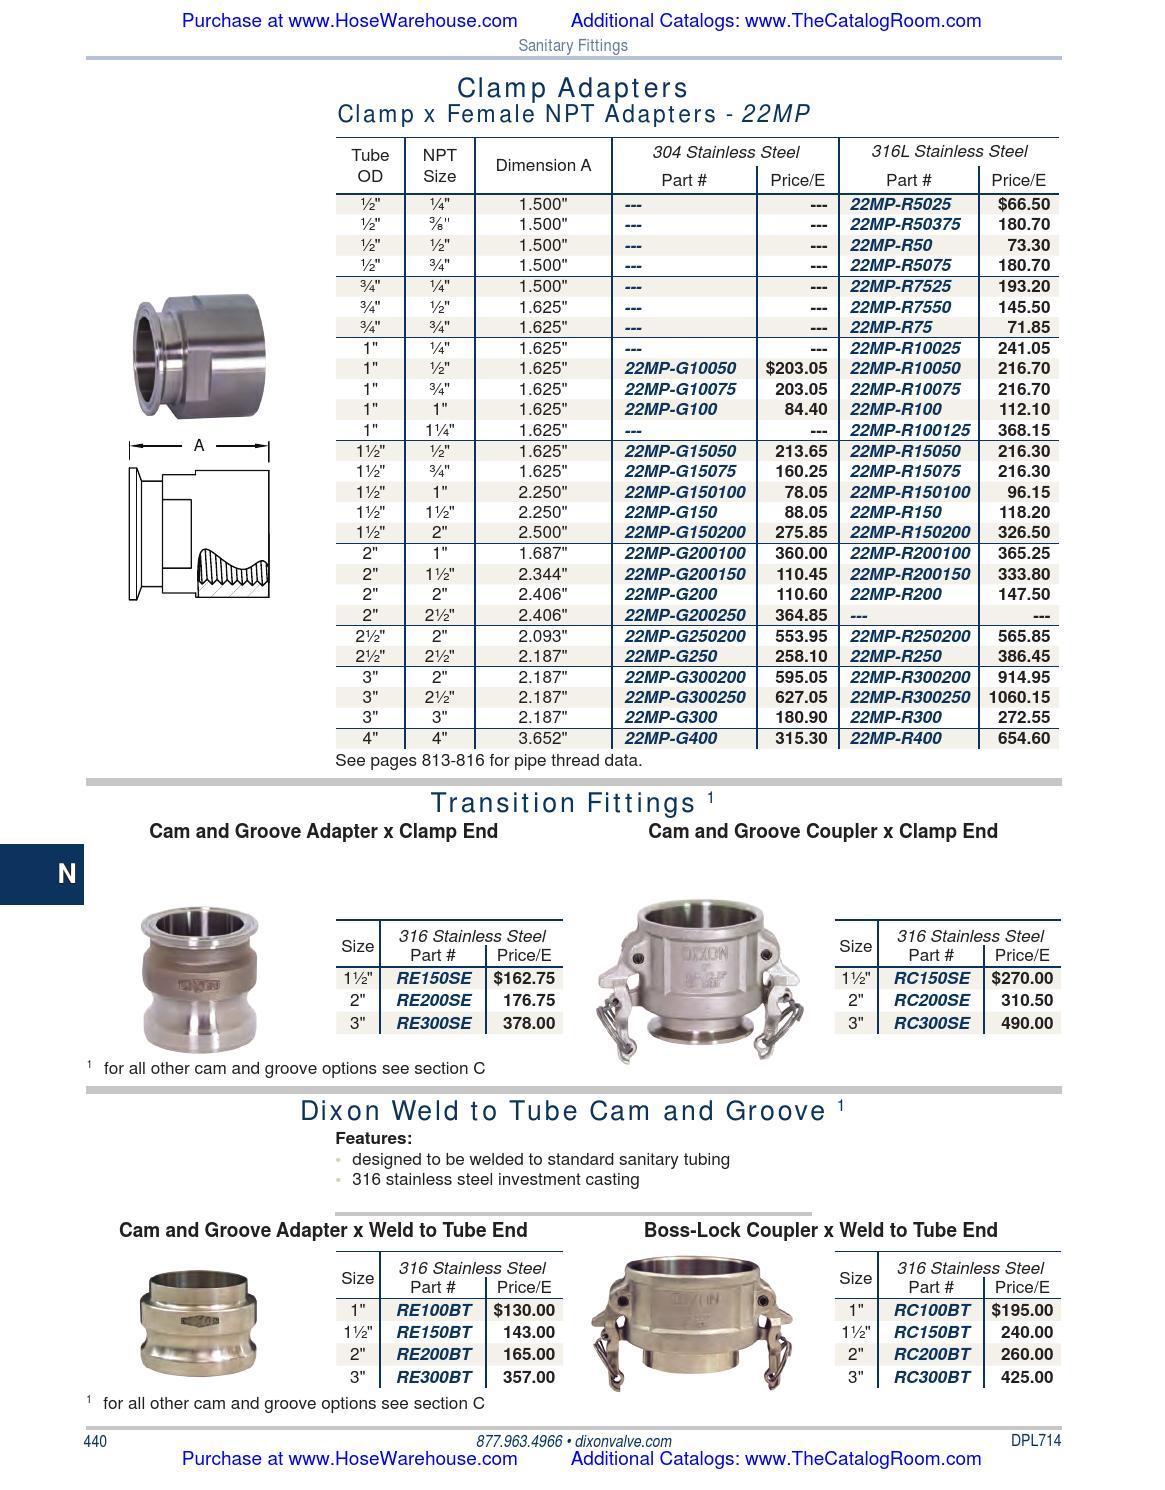 Dixon 22MP-R100125 1 x 1.25 316L Clamp x Female NPT Adapter